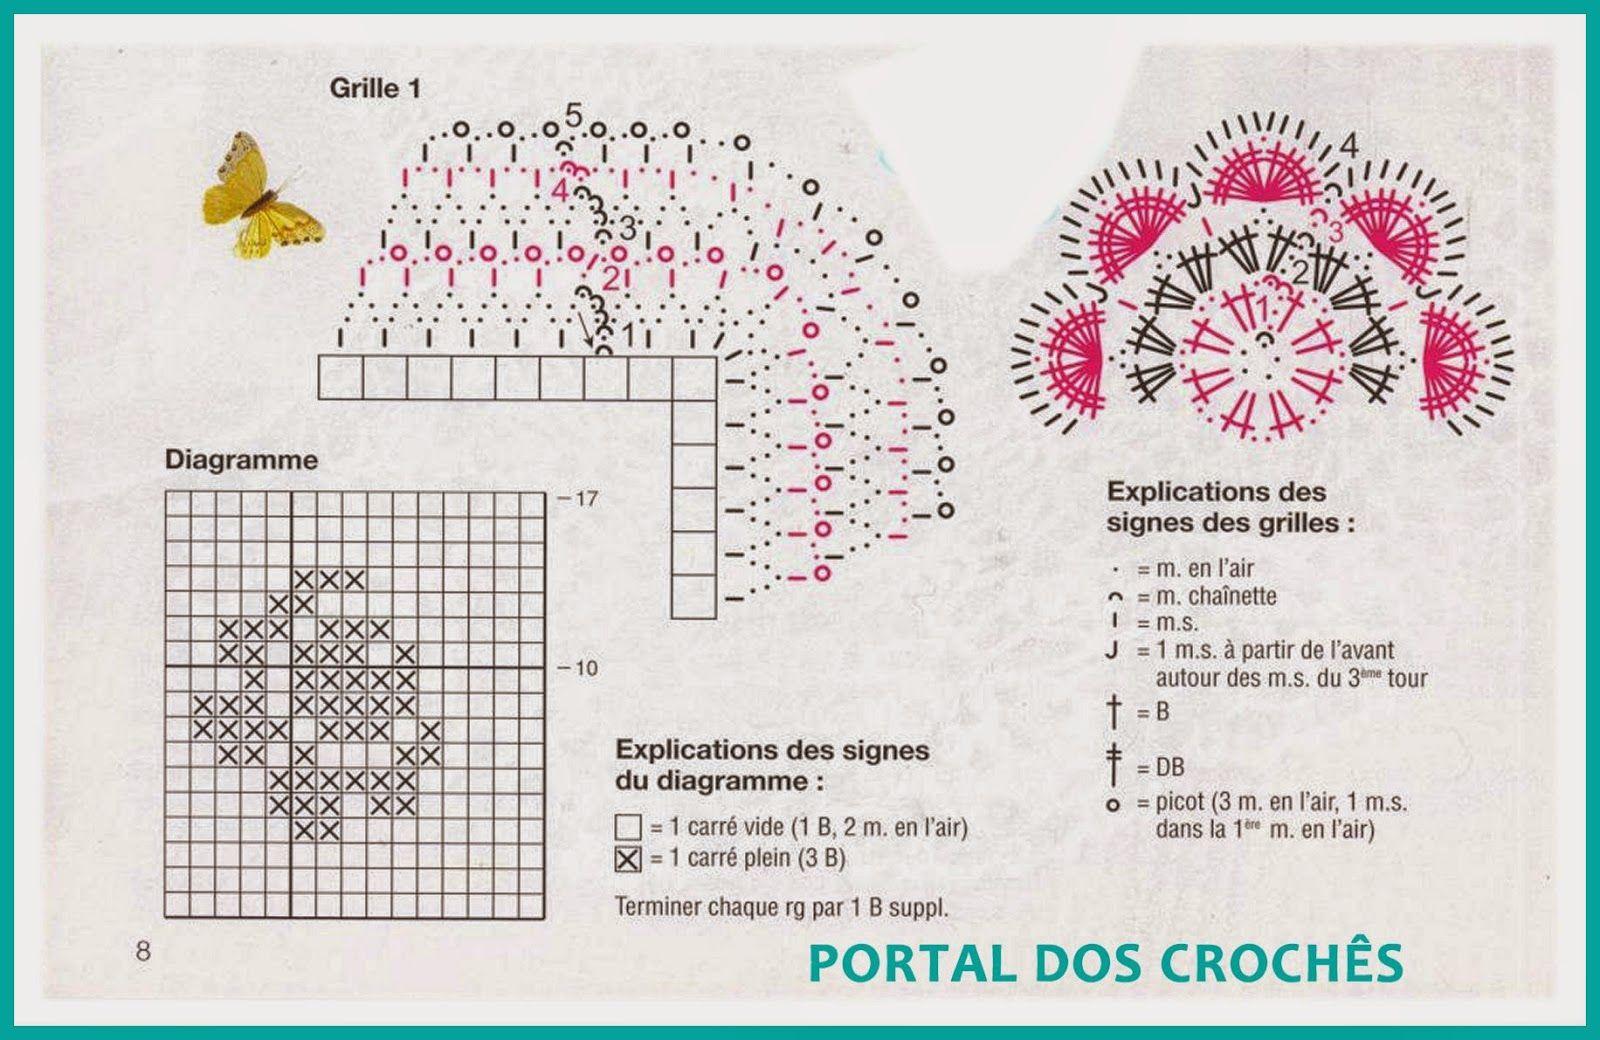 PORTAL DOS CROCHÊS: